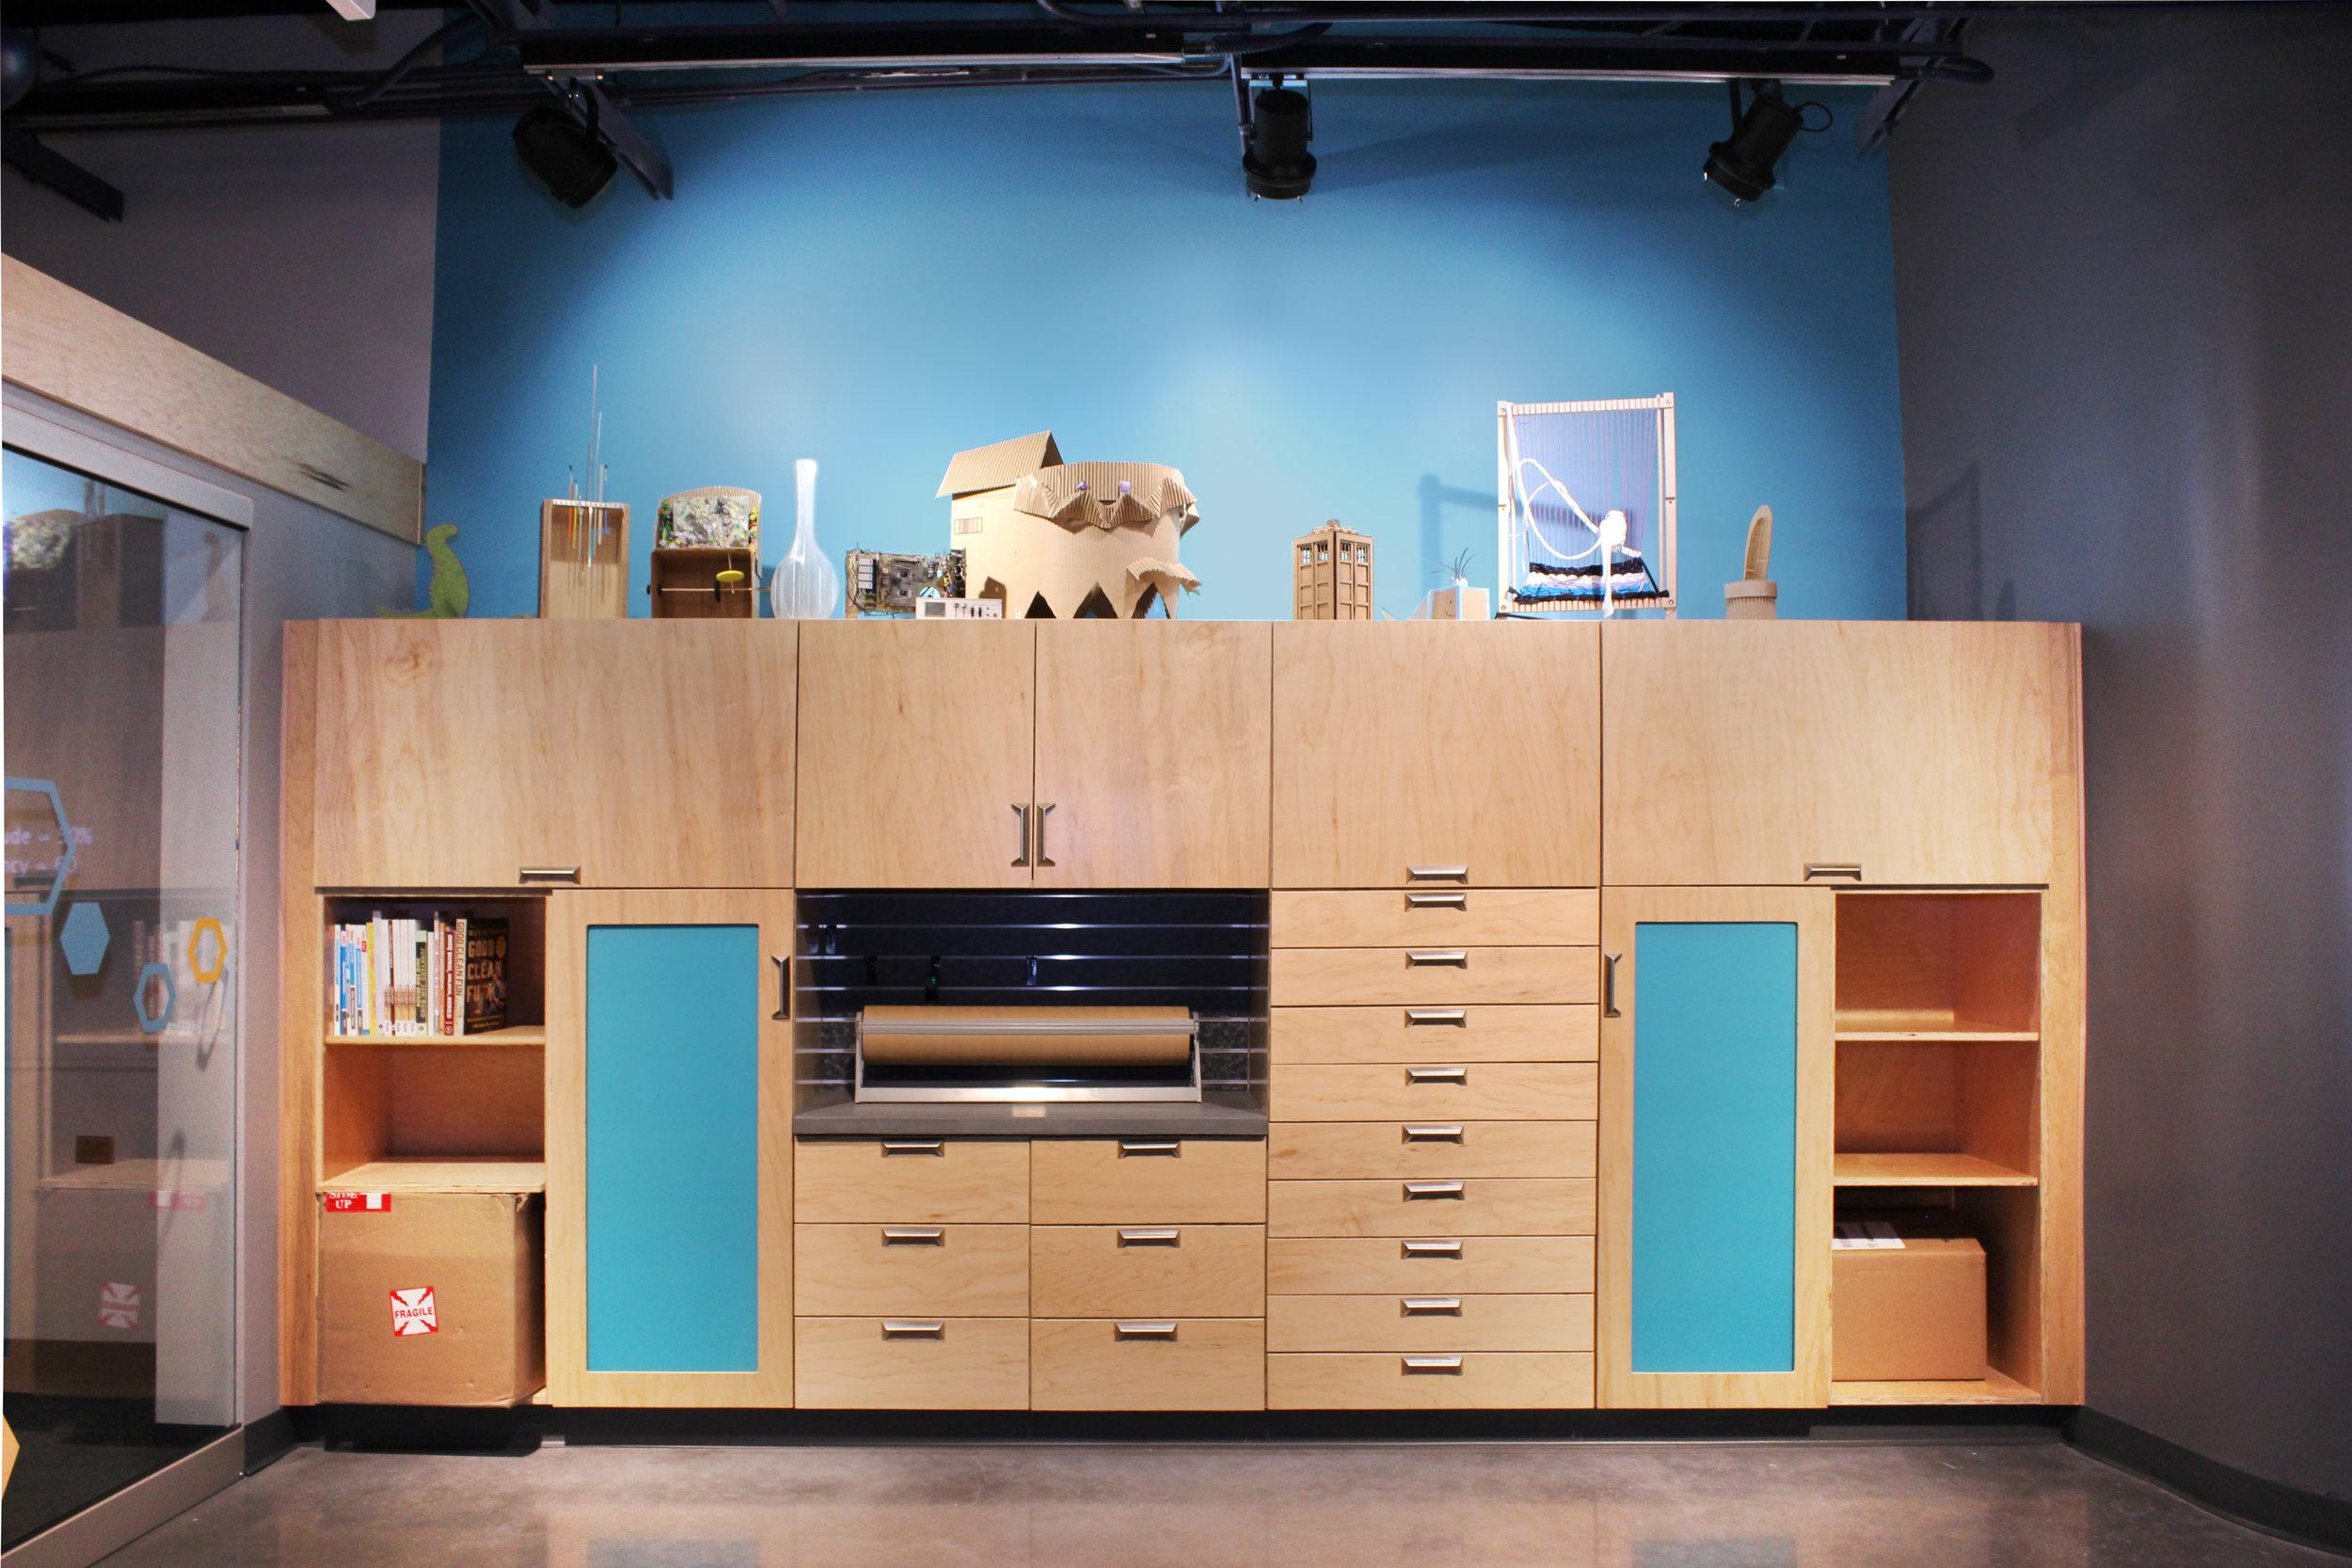 The Hive Storage Center